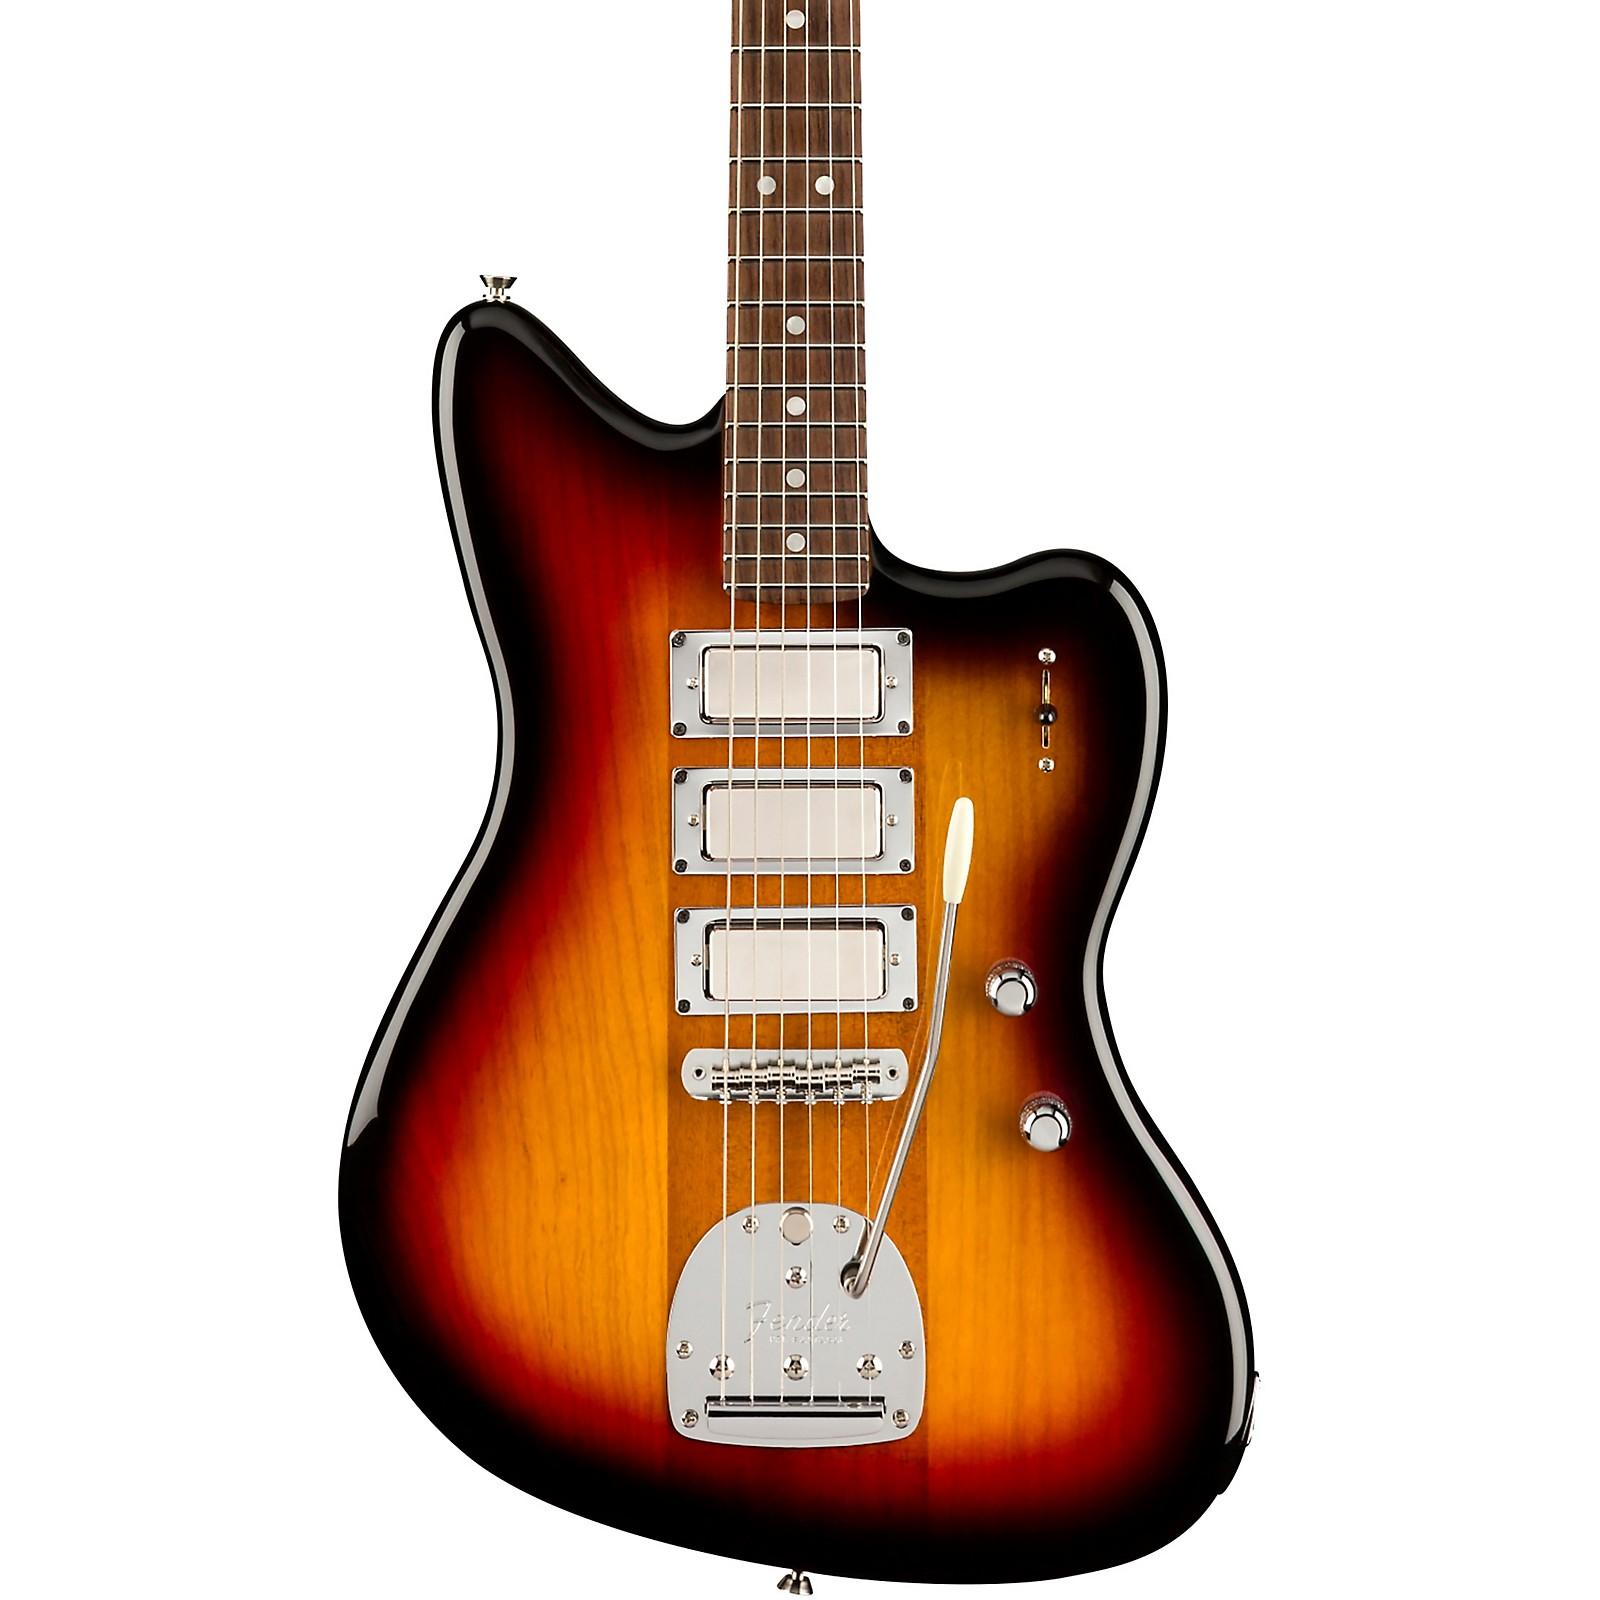 Fender Parallel Universe Vol. II Spark-O-Matic Jazzmaster Electric Guitar